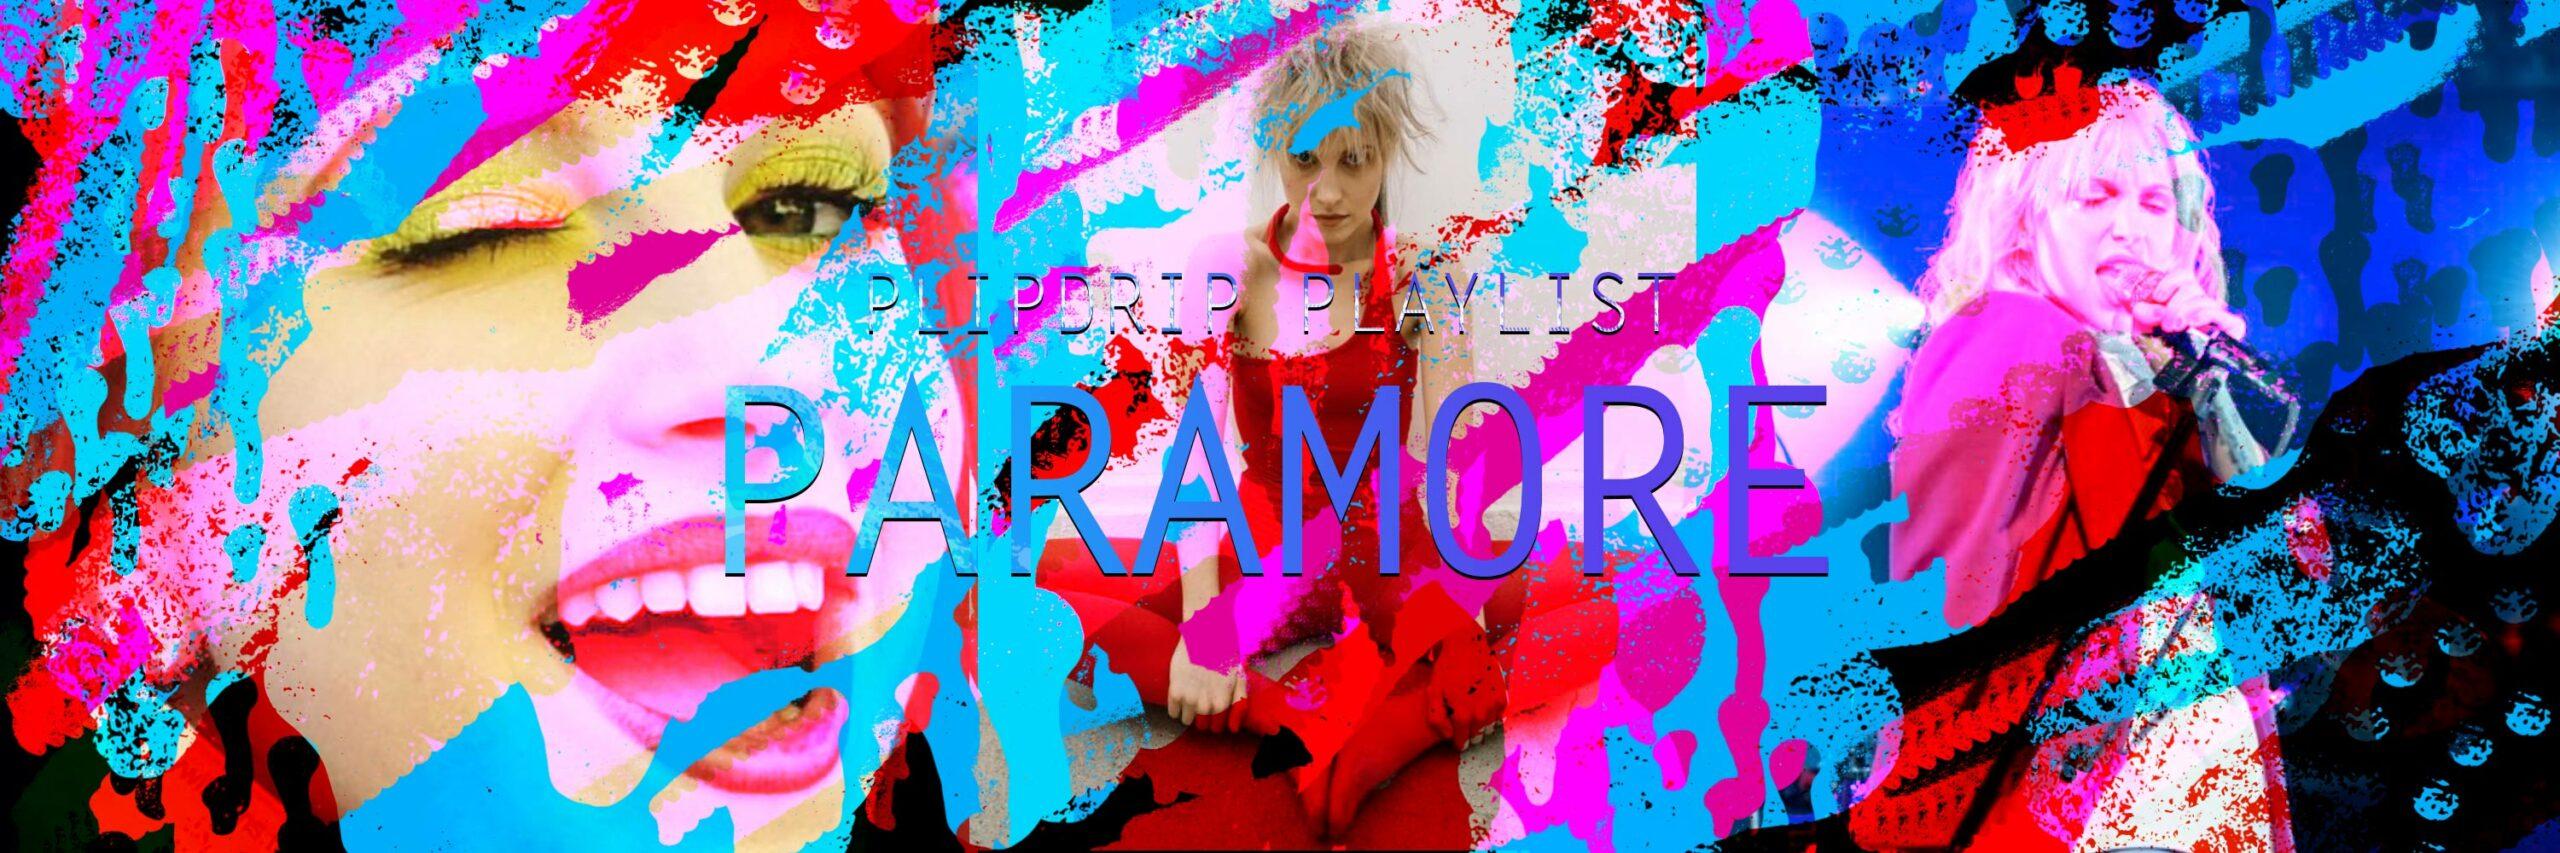 PF-paramore-banner-1